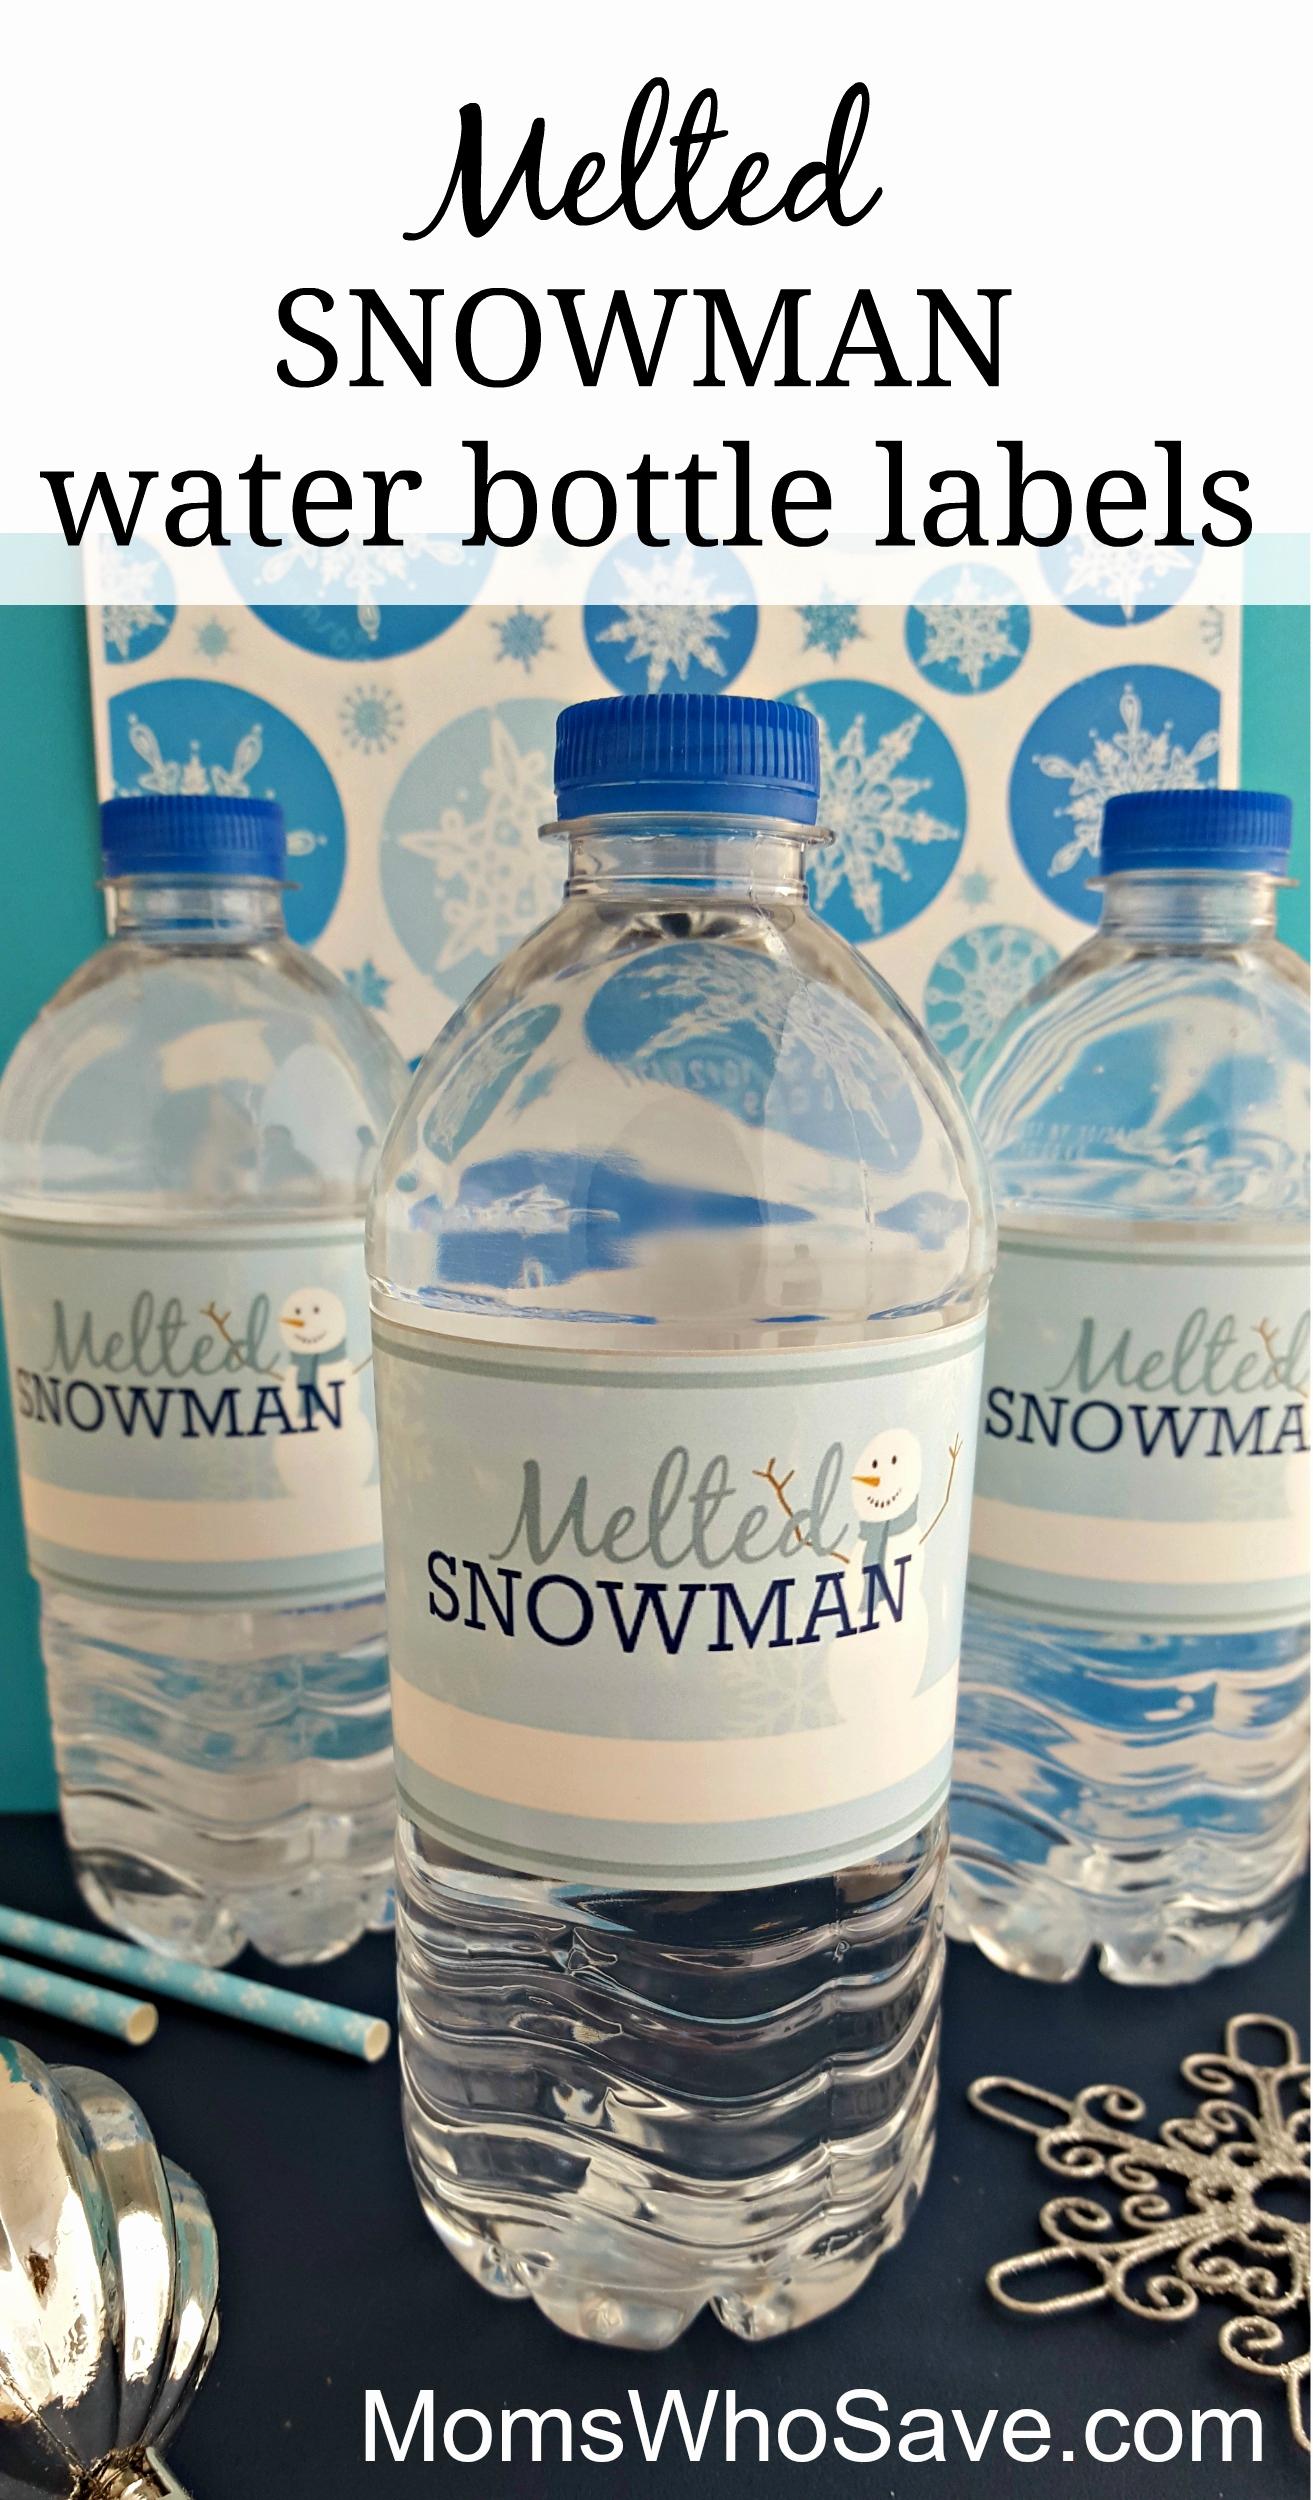 Printable Water Bottle Labels Lovely Easy Diy Free Printable Melted Snowman Water Bottle